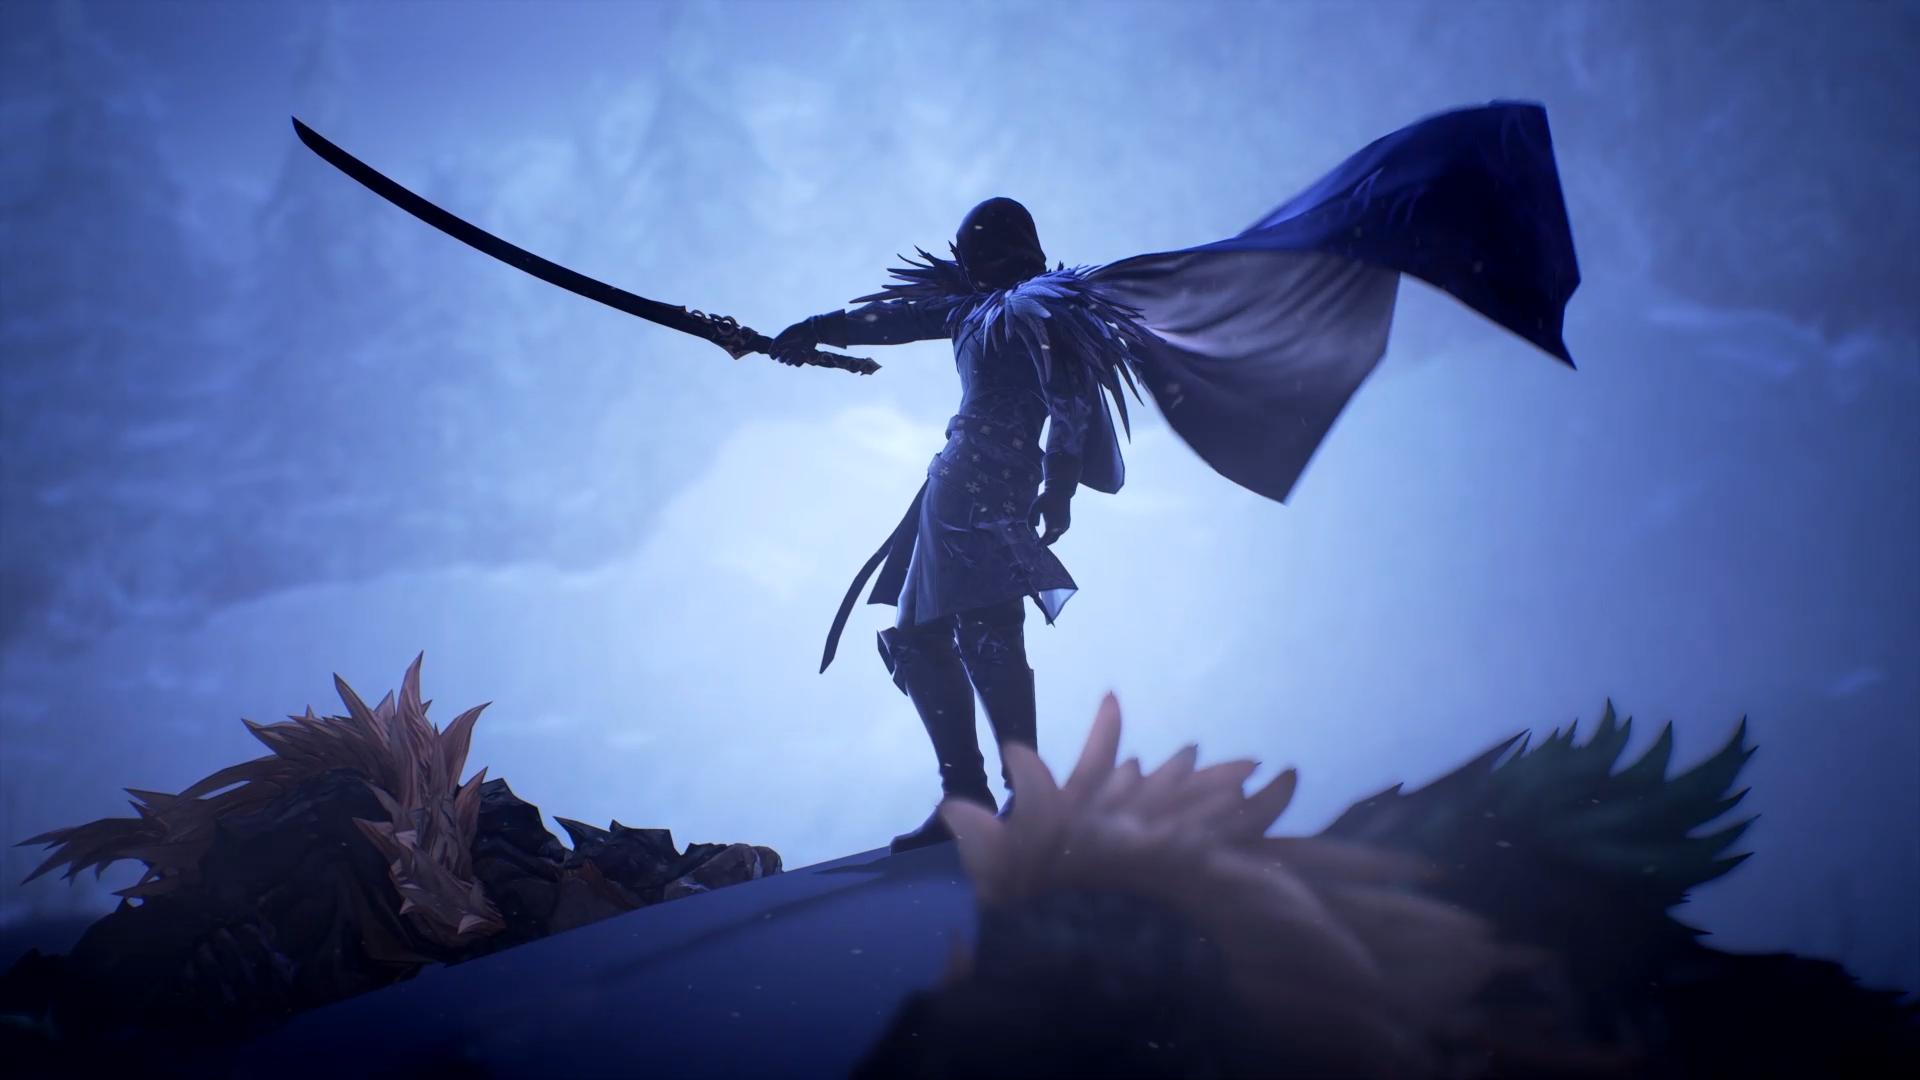 Tales of Arise musta ritari black knight